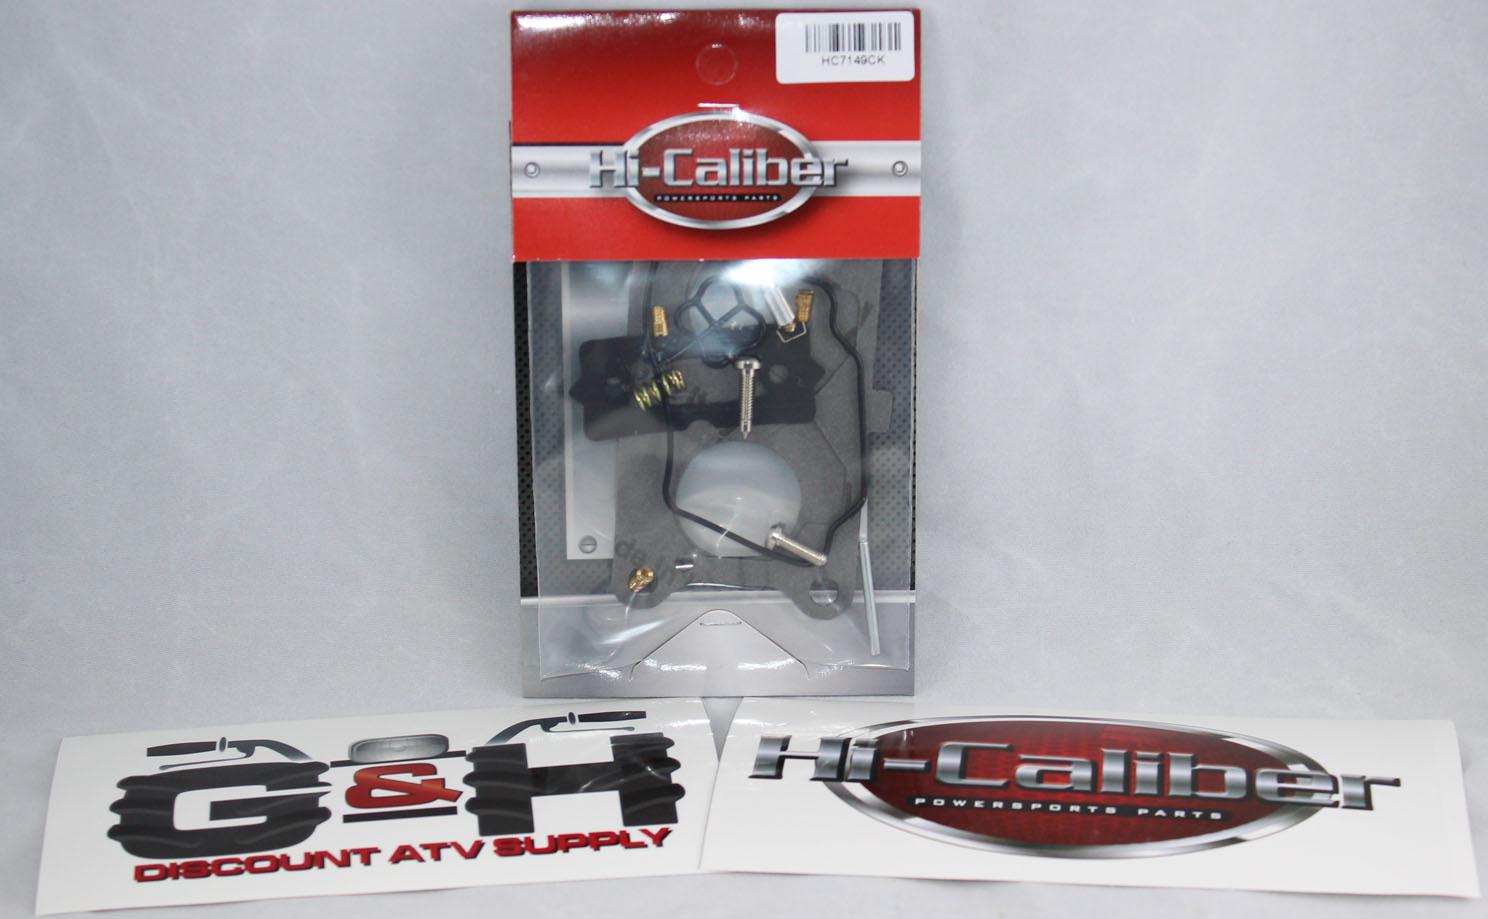 Kawasaki Caliber Rebuild Kits